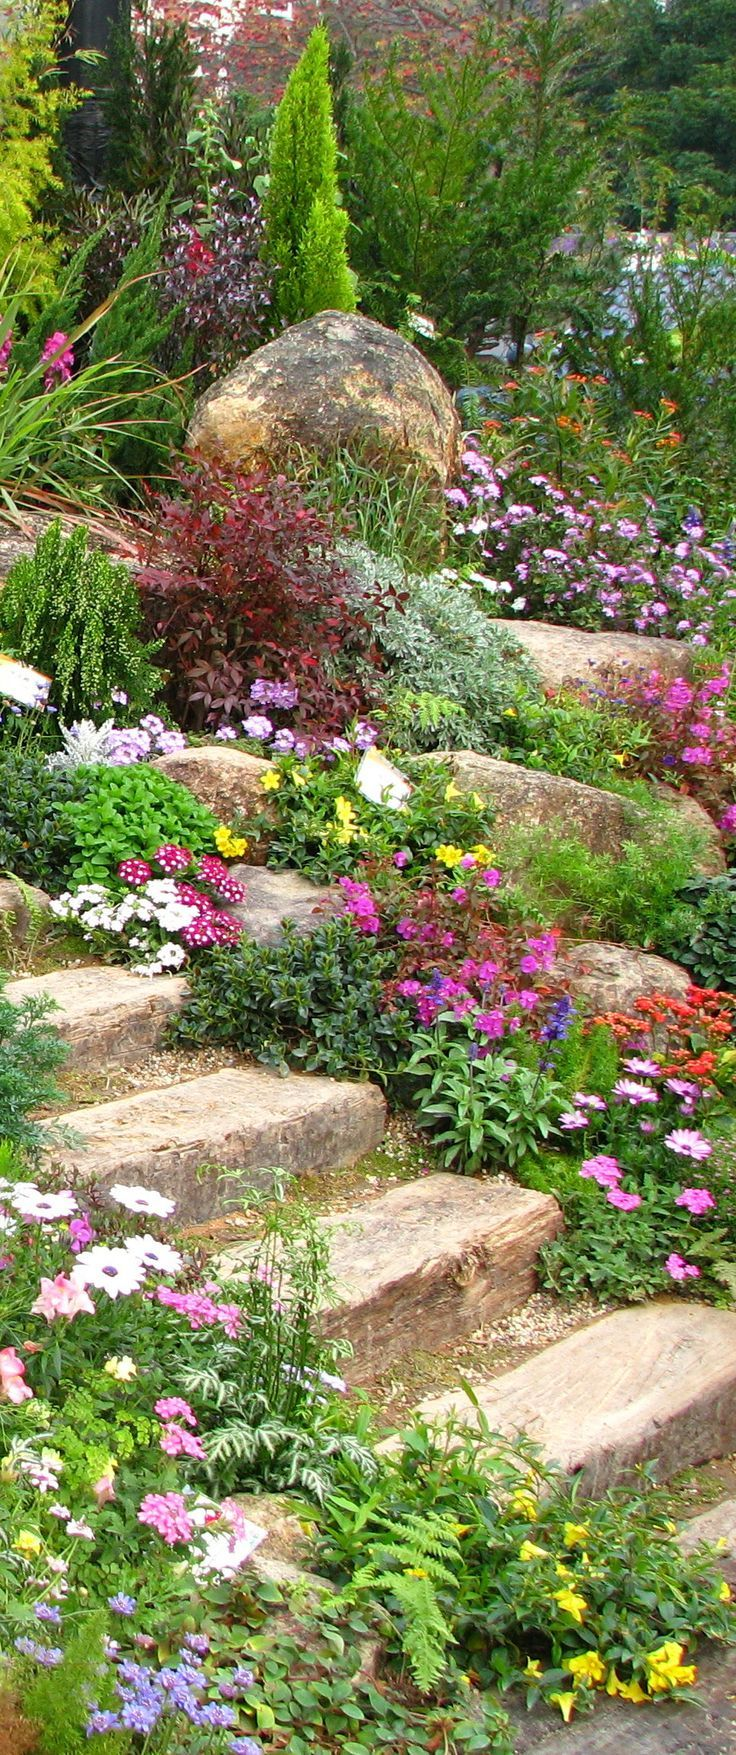 901 best landscaping a slope images on pinterest backyard ideas garden ideas and yard crashers. Black Bedroom Furniture Sets. Home Design Ideas